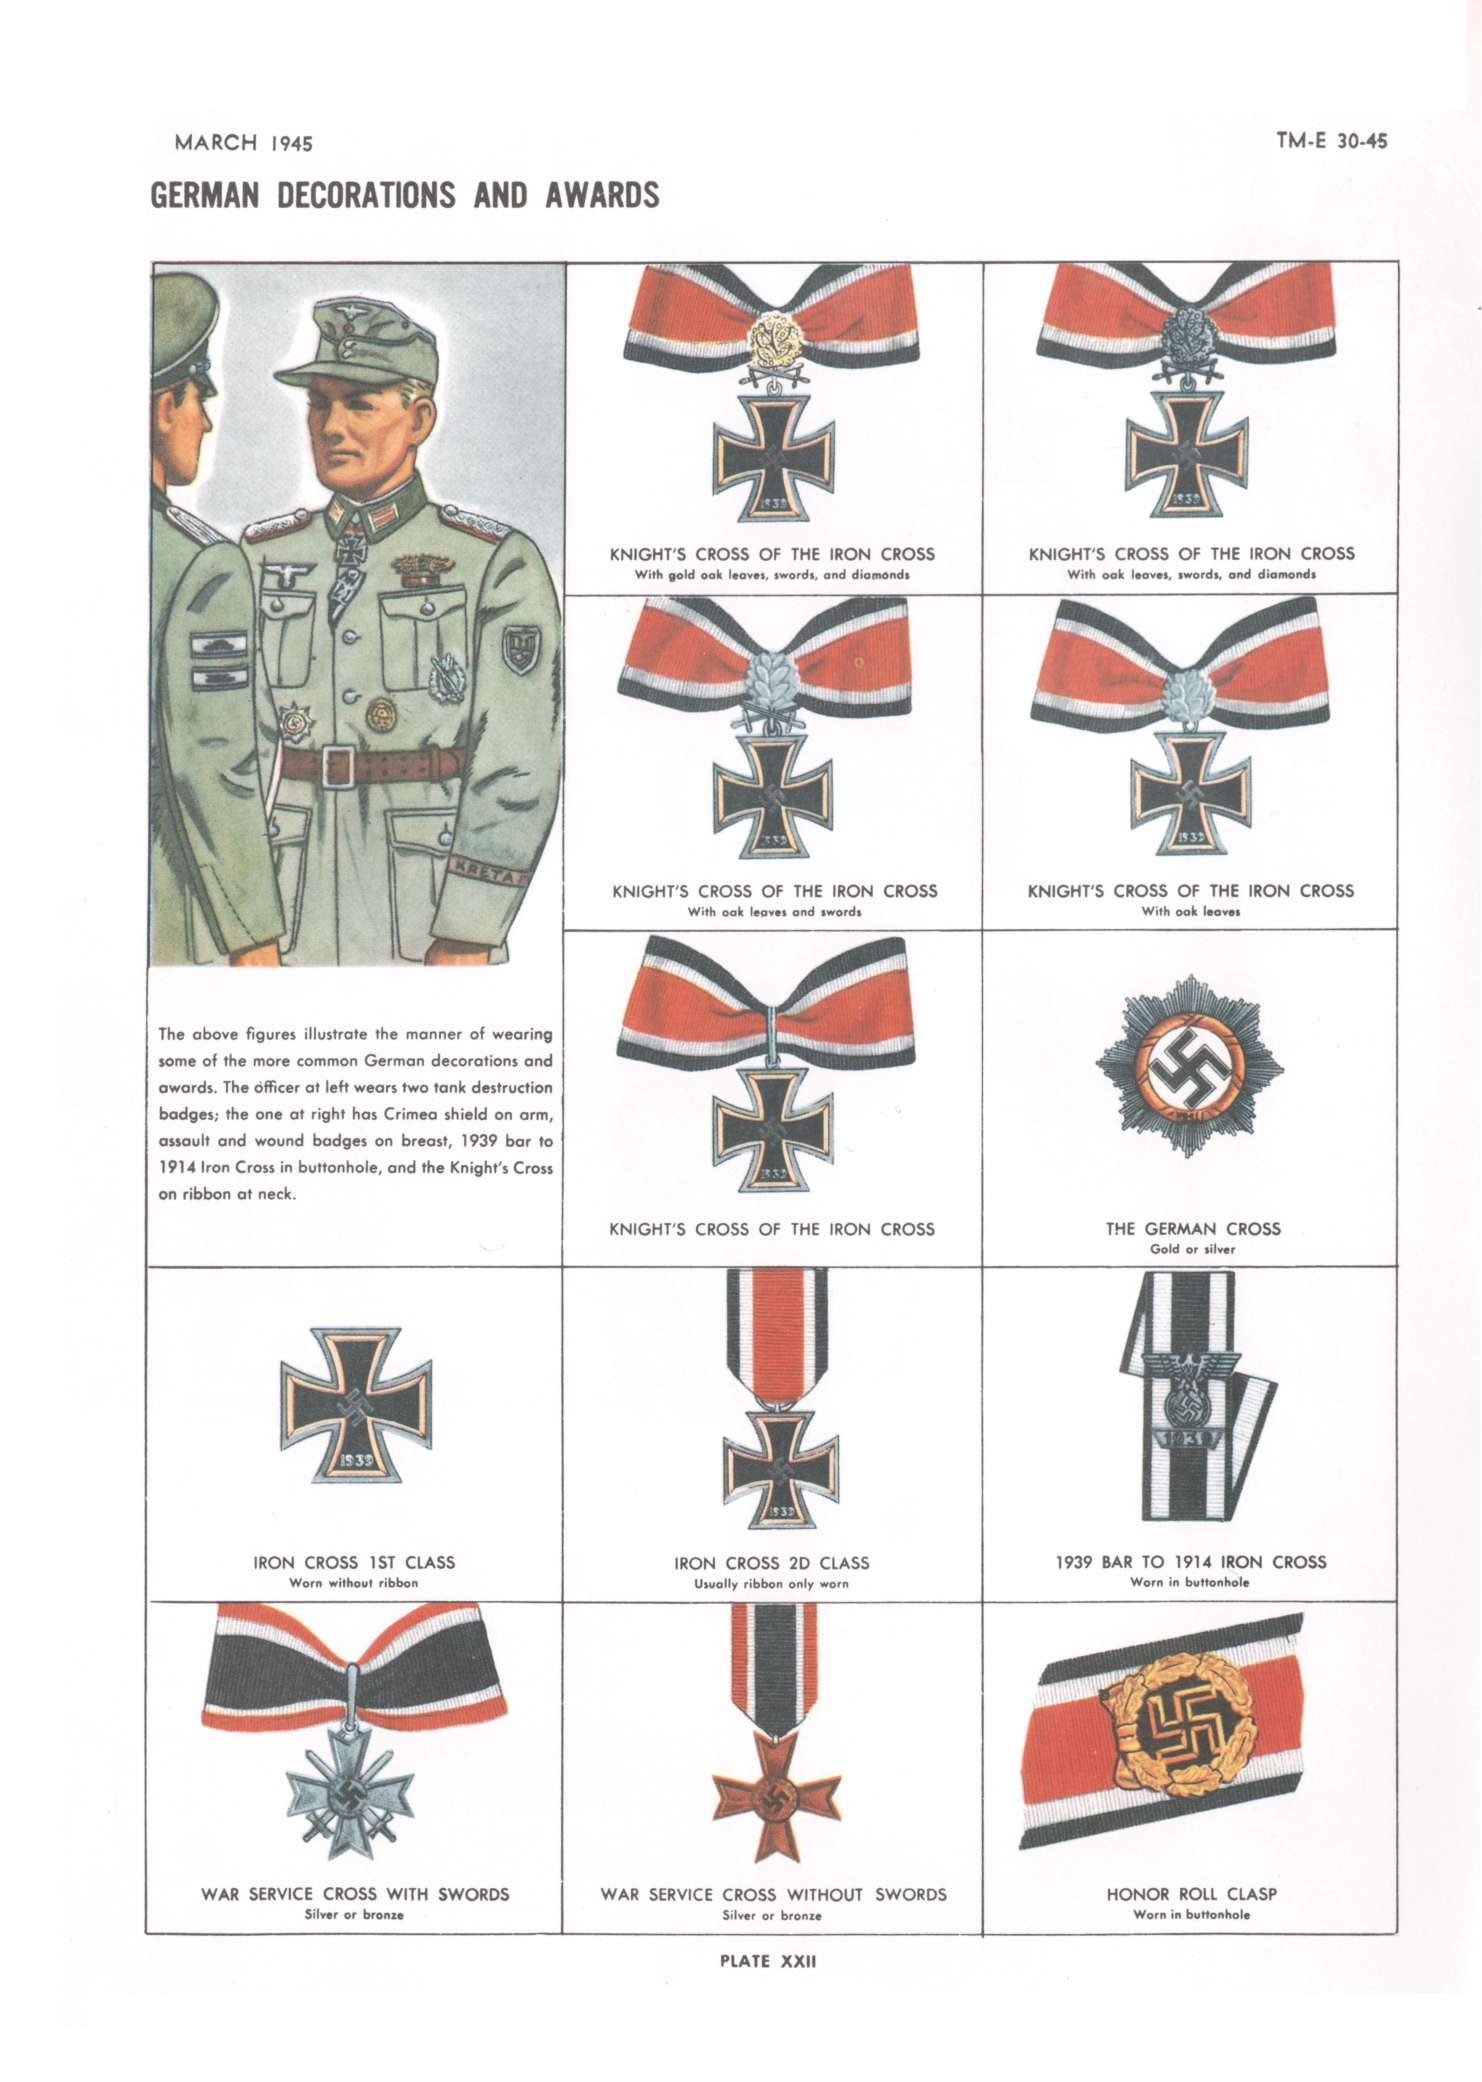 Hyperwar handbook on german military forces chapter 9 - German military decorations ww2 ...